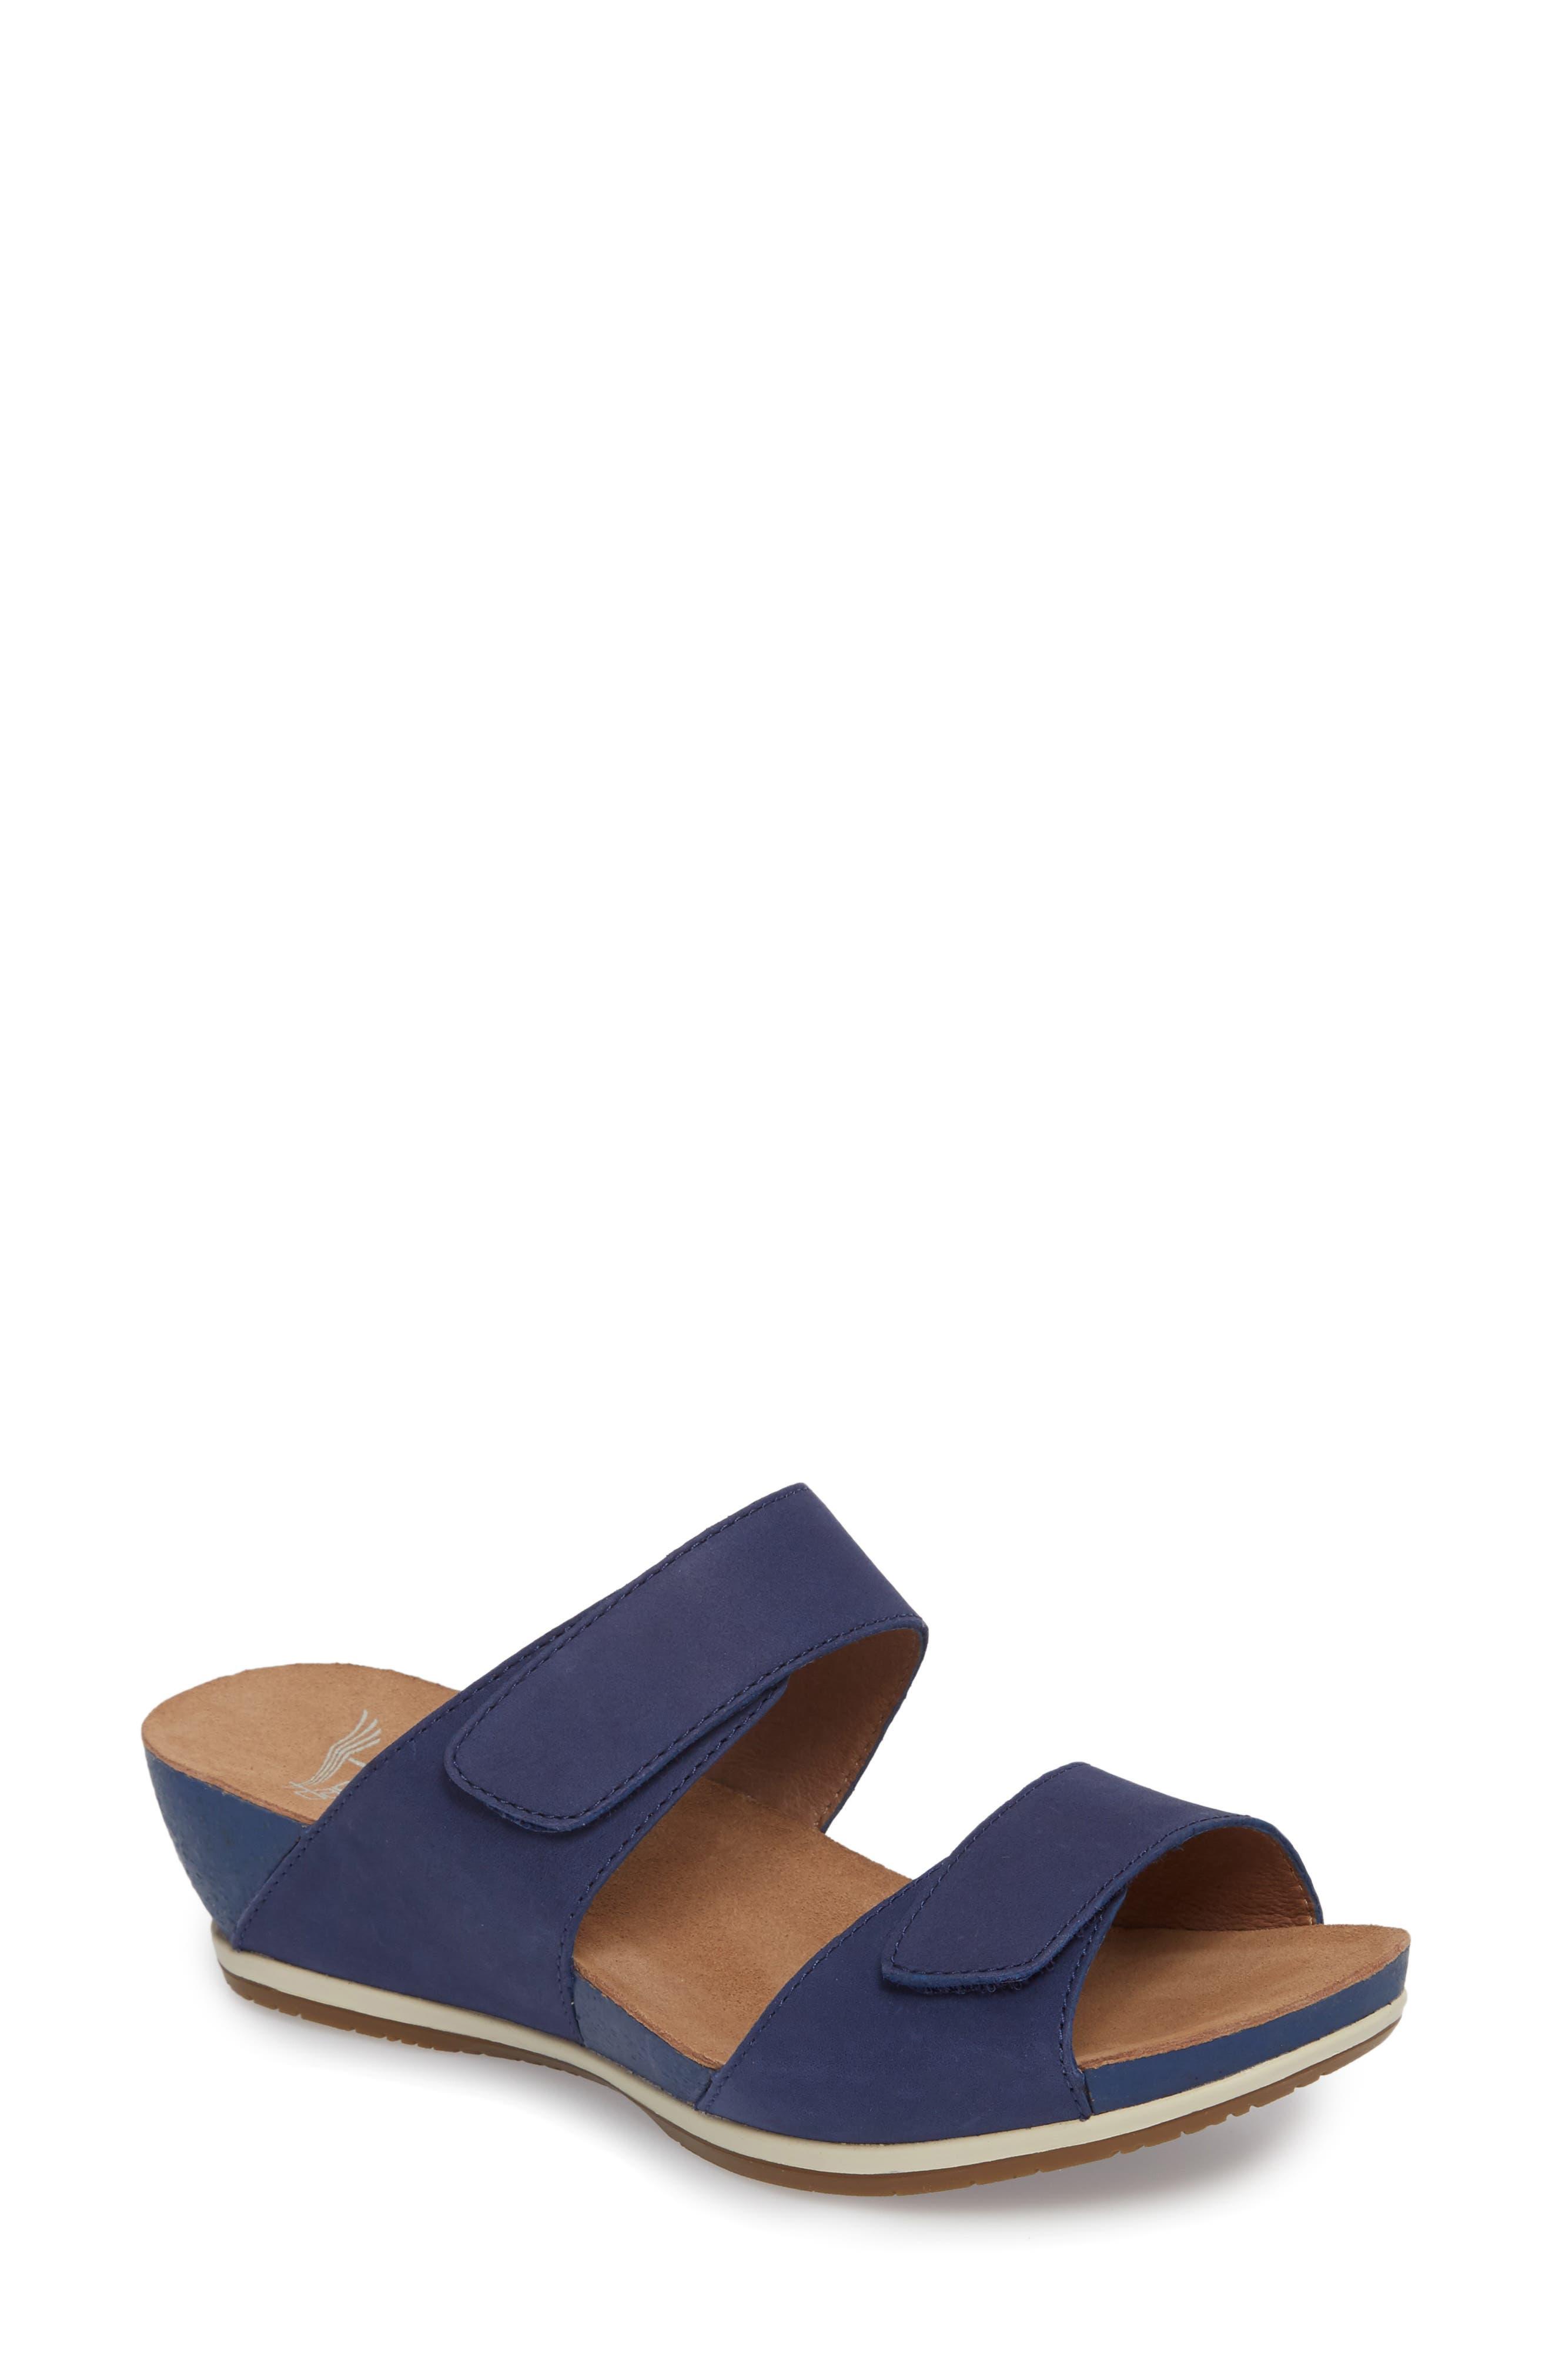 Vienna Slide Sandal,                         Main,                         color, Blue Milled Nubuck Leather